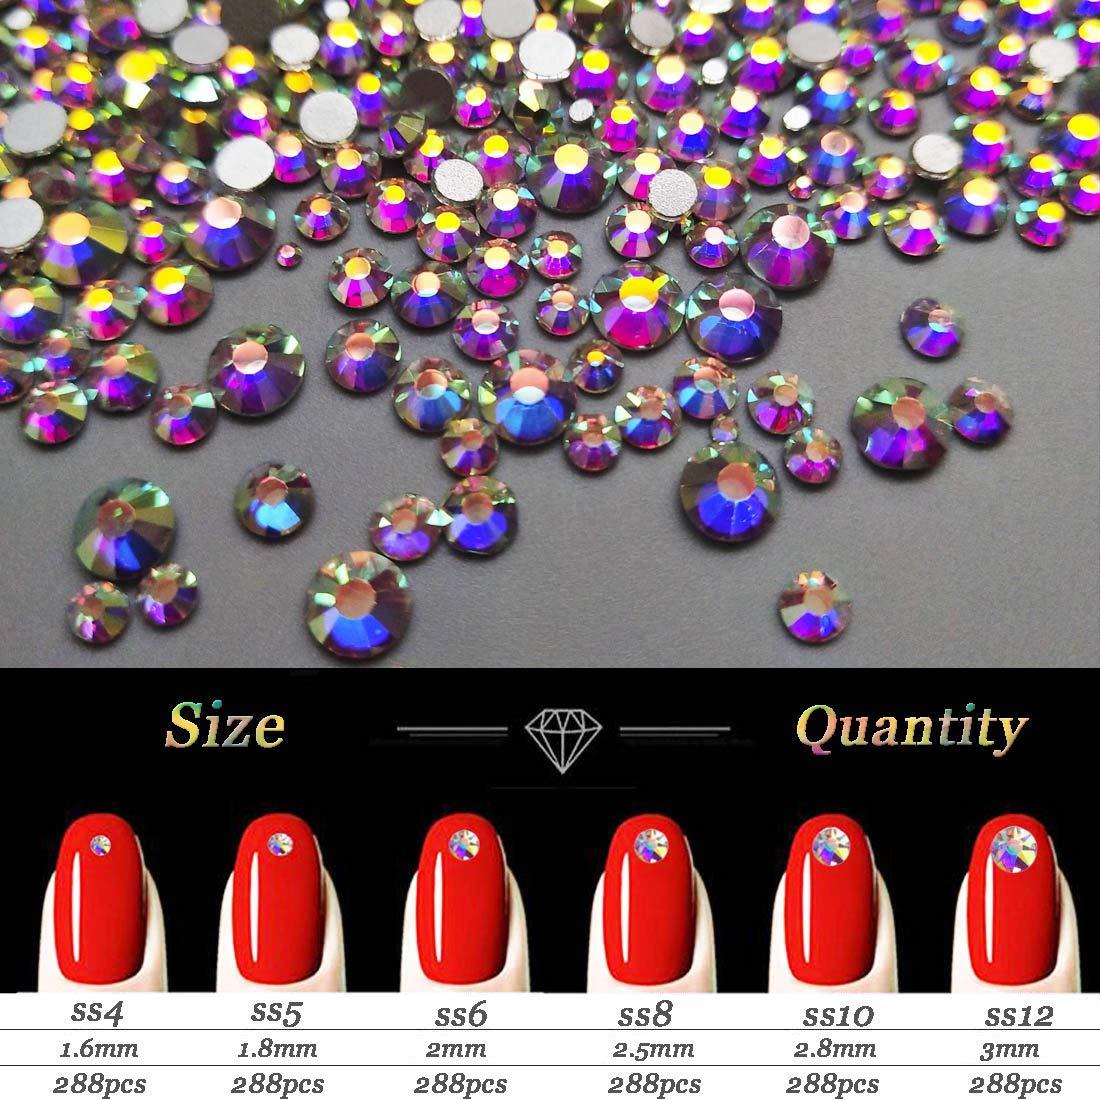 AB Crystal Rhinestones Set 100+1728 Pcs, Round and Multishape AB Glass Rhinestone, Flatback AB Crystals for Nails Clothes Face Jewelry: Beauty